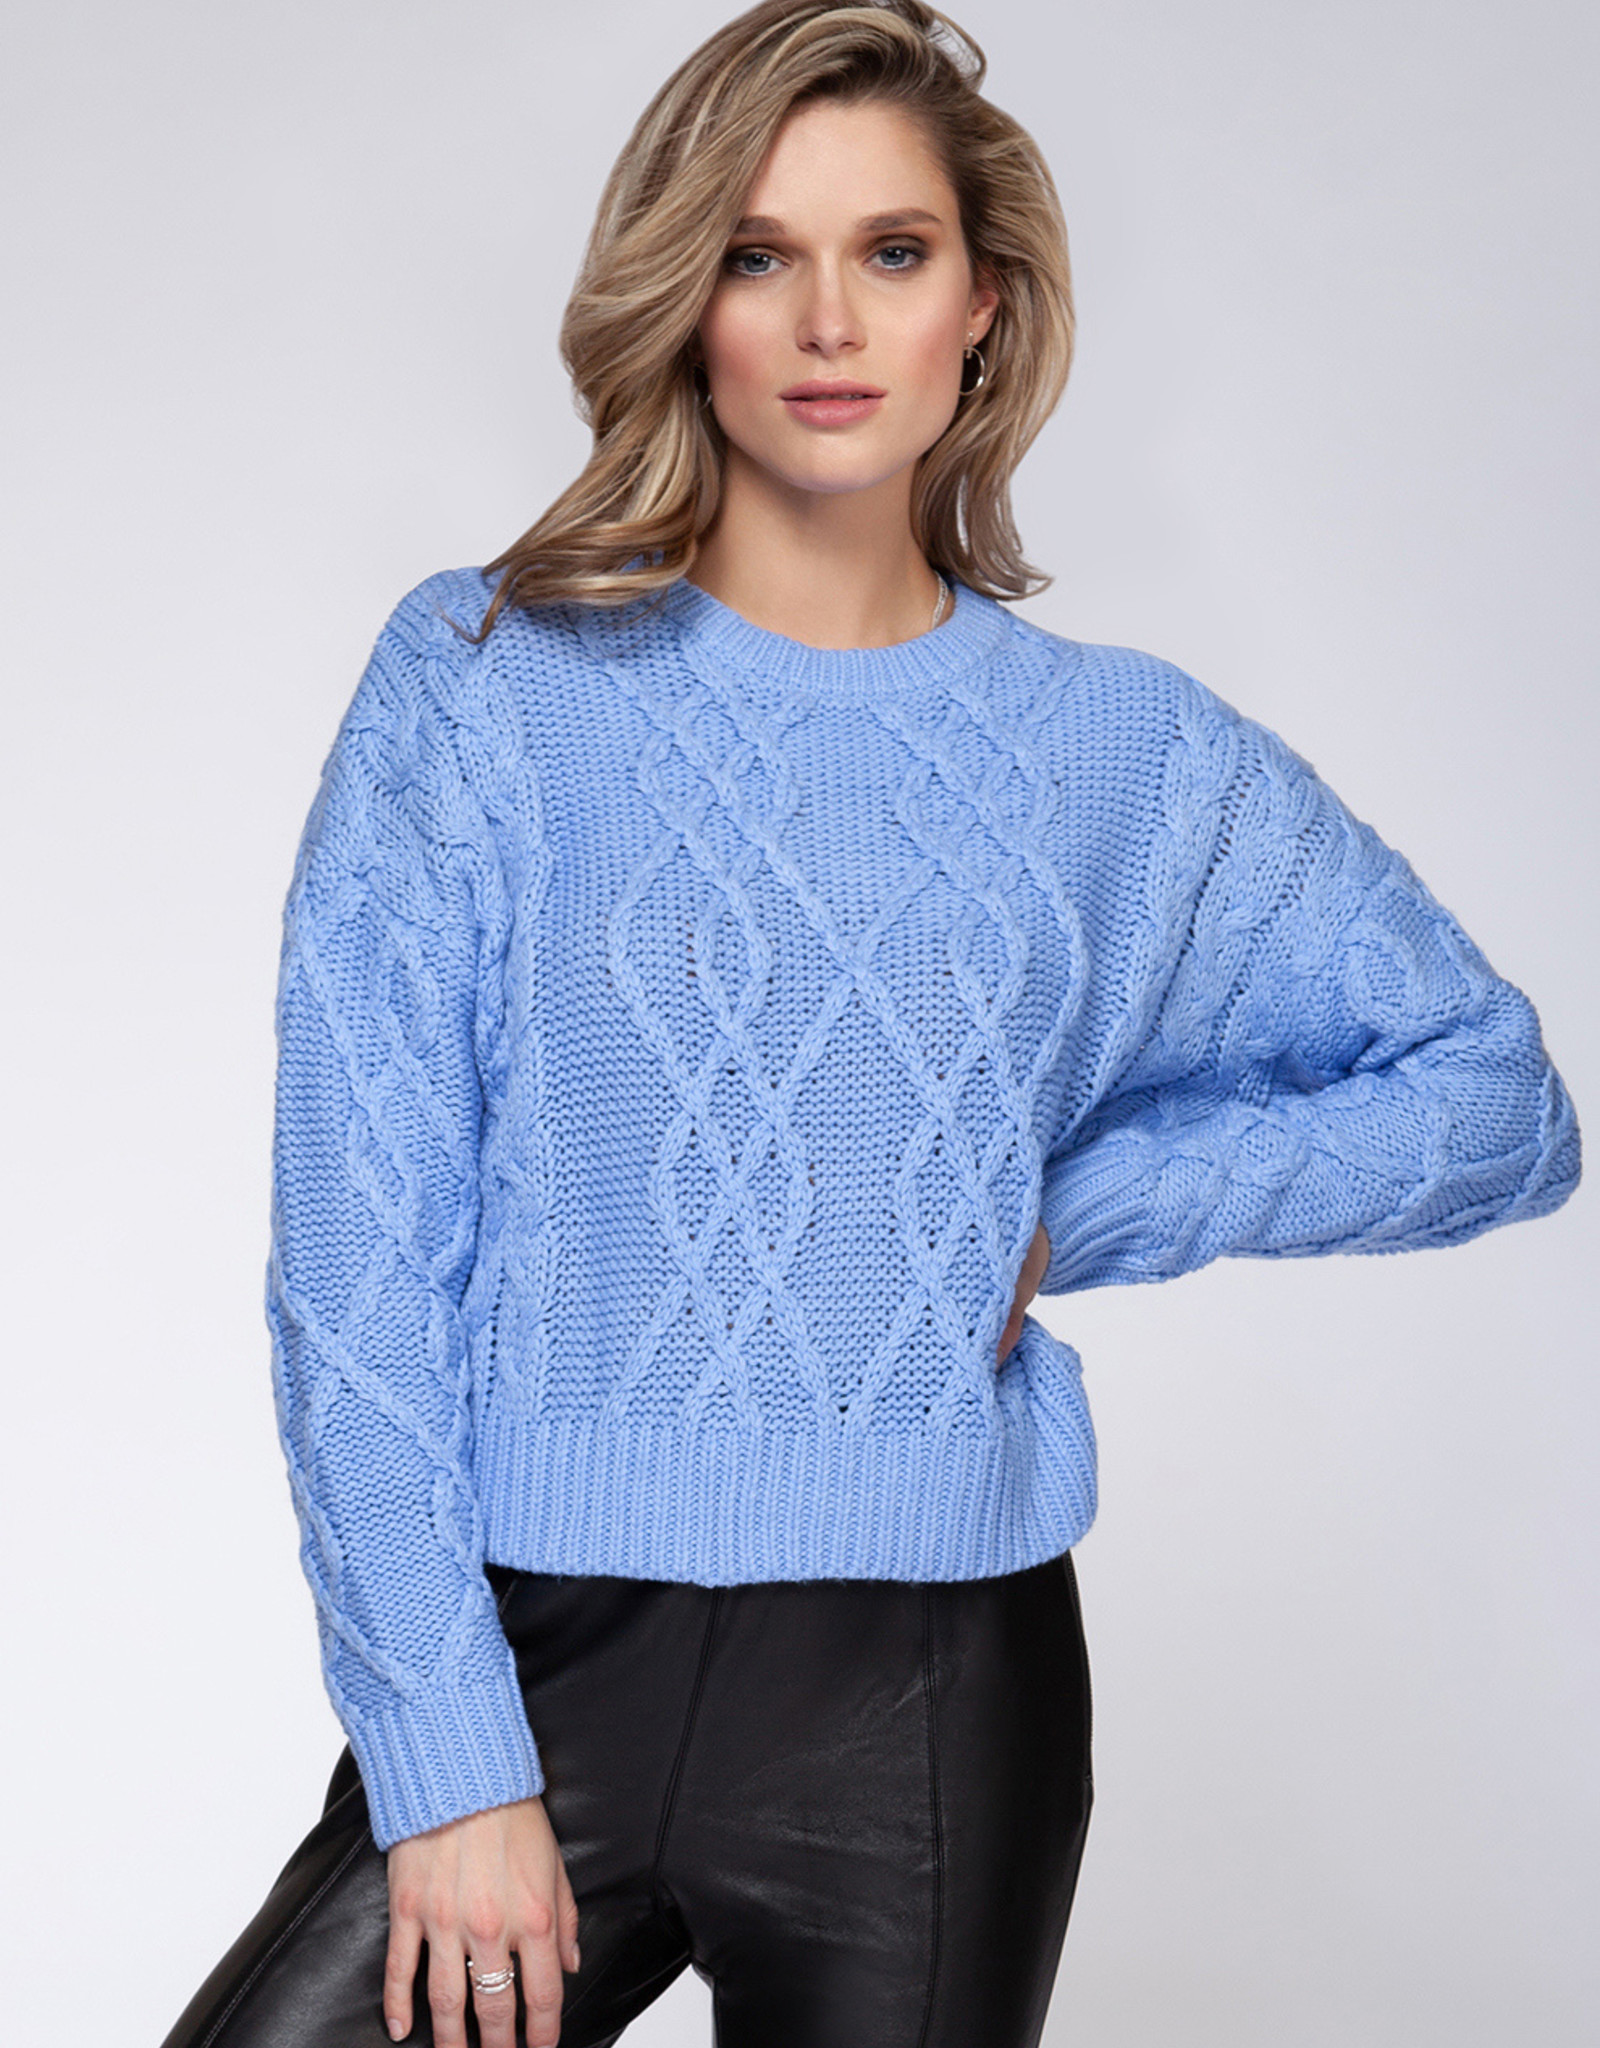 Black Tape Periwinkle Sweater